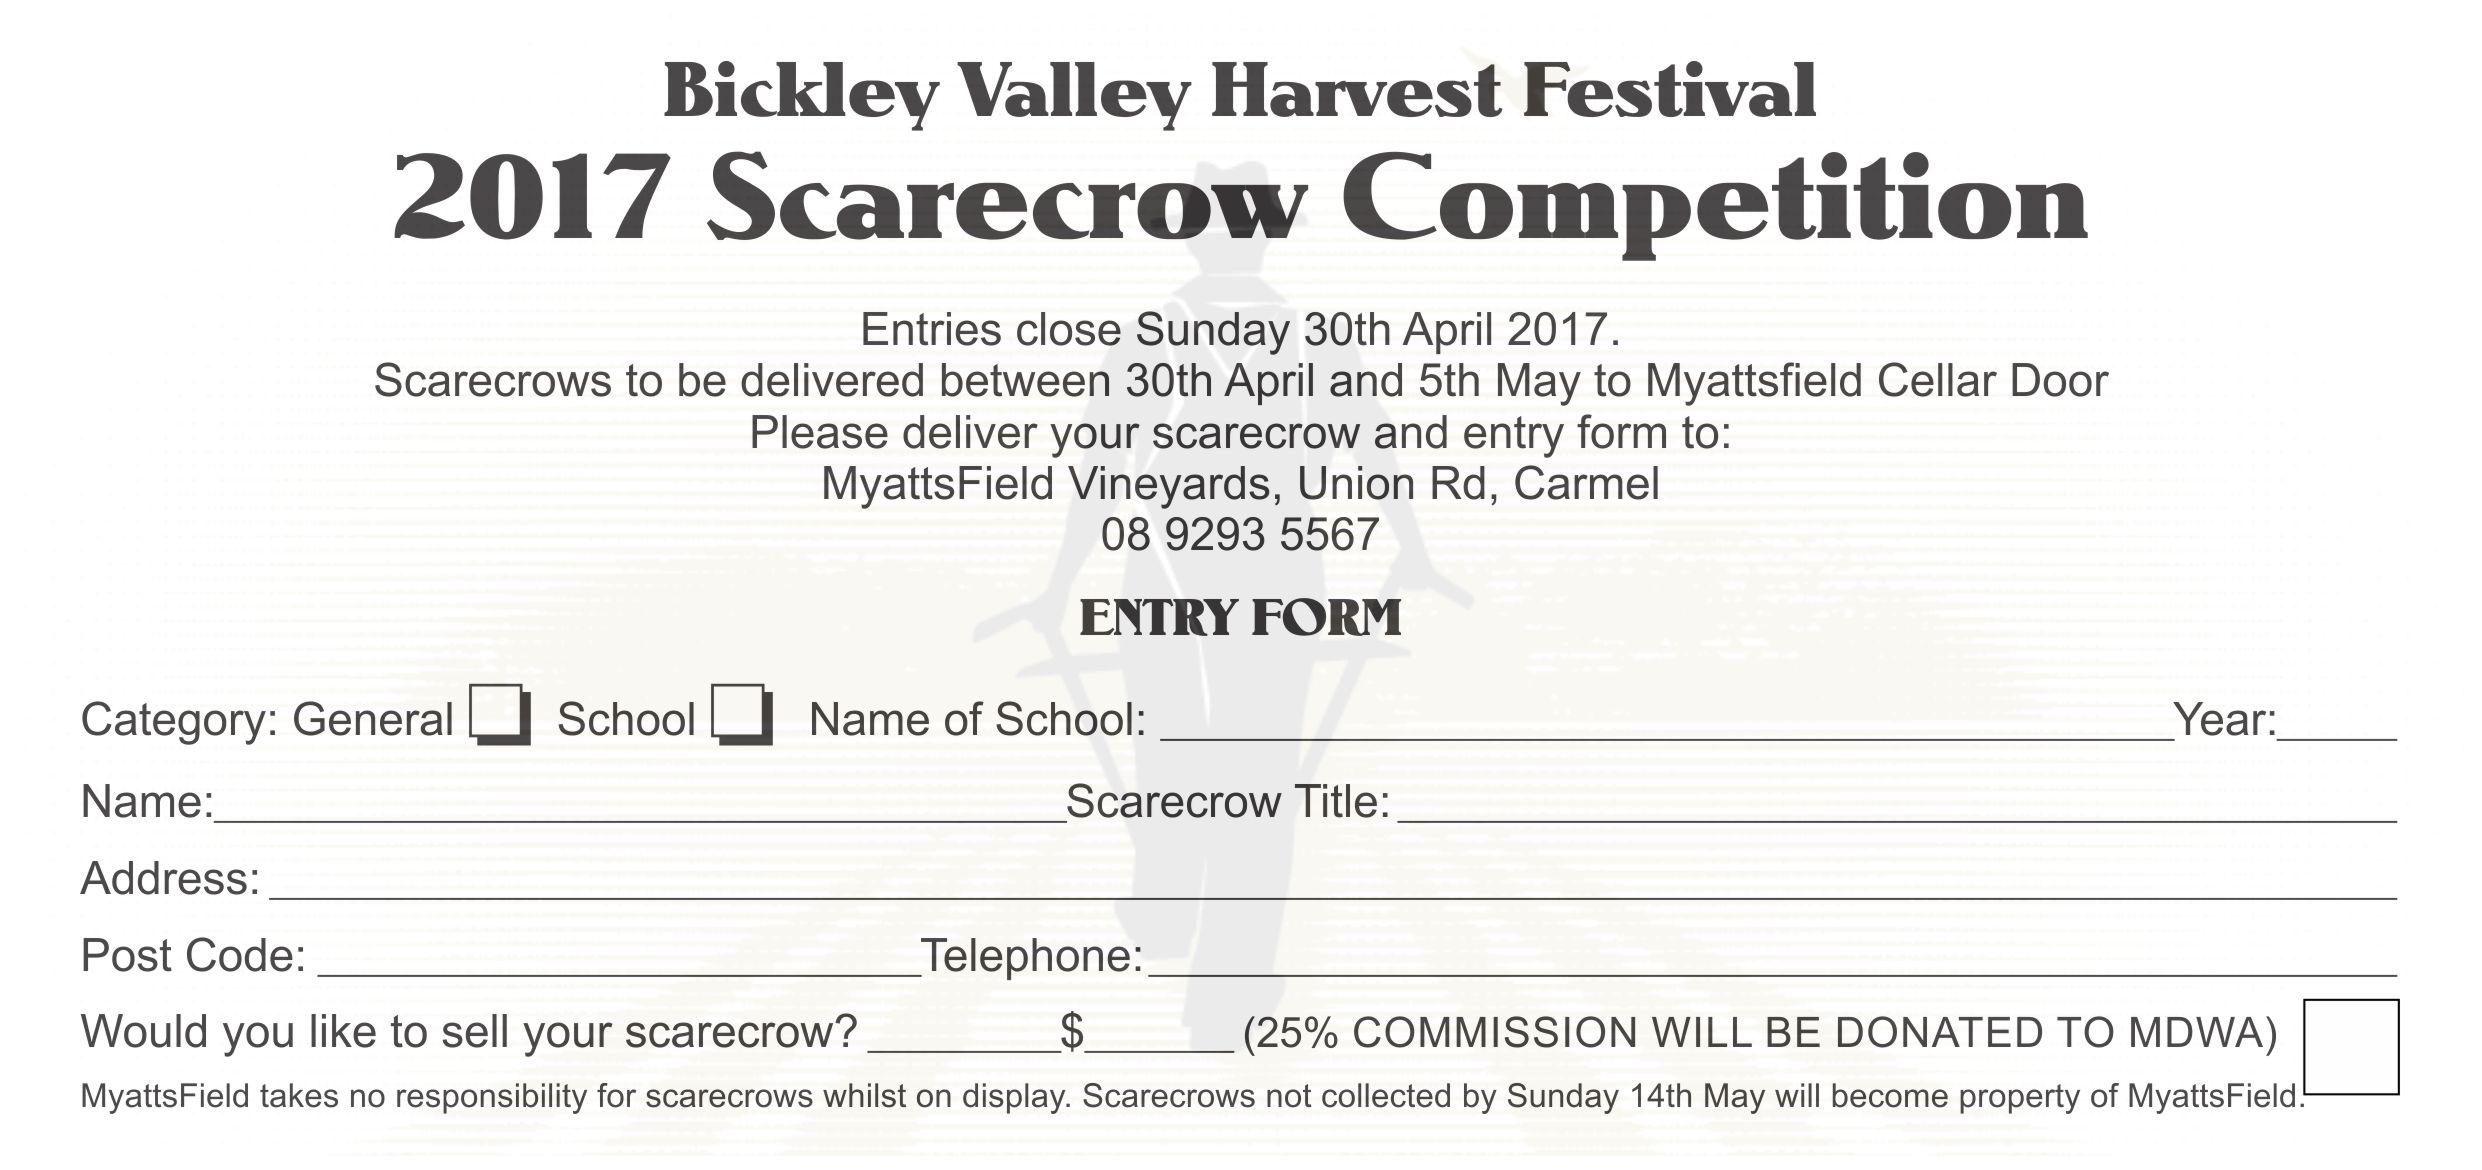 2017-scarecrow-comp-entry-form